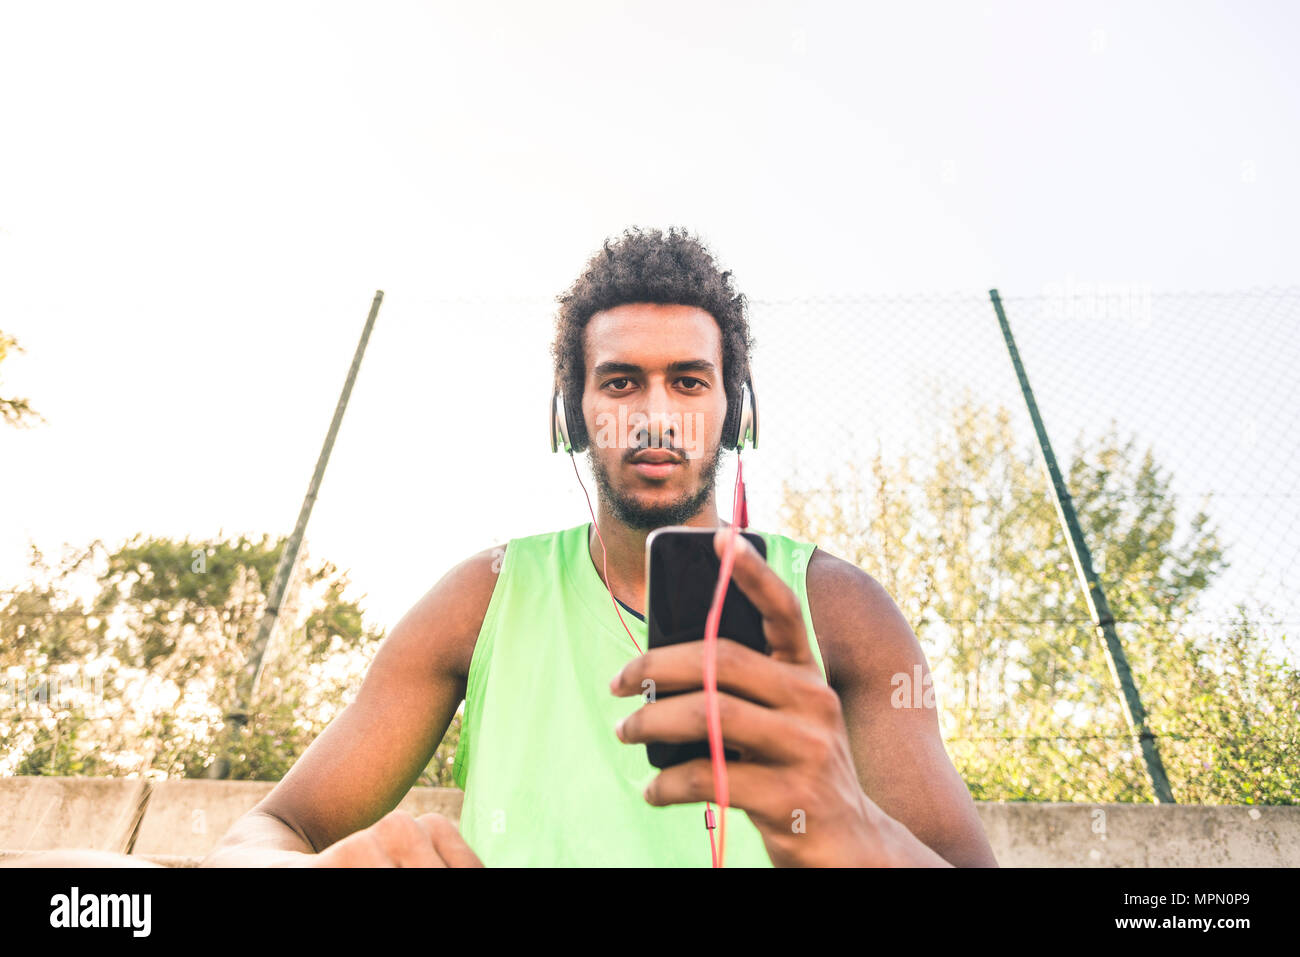 Basketball player listening music, smartphone and headphones - Stock Image